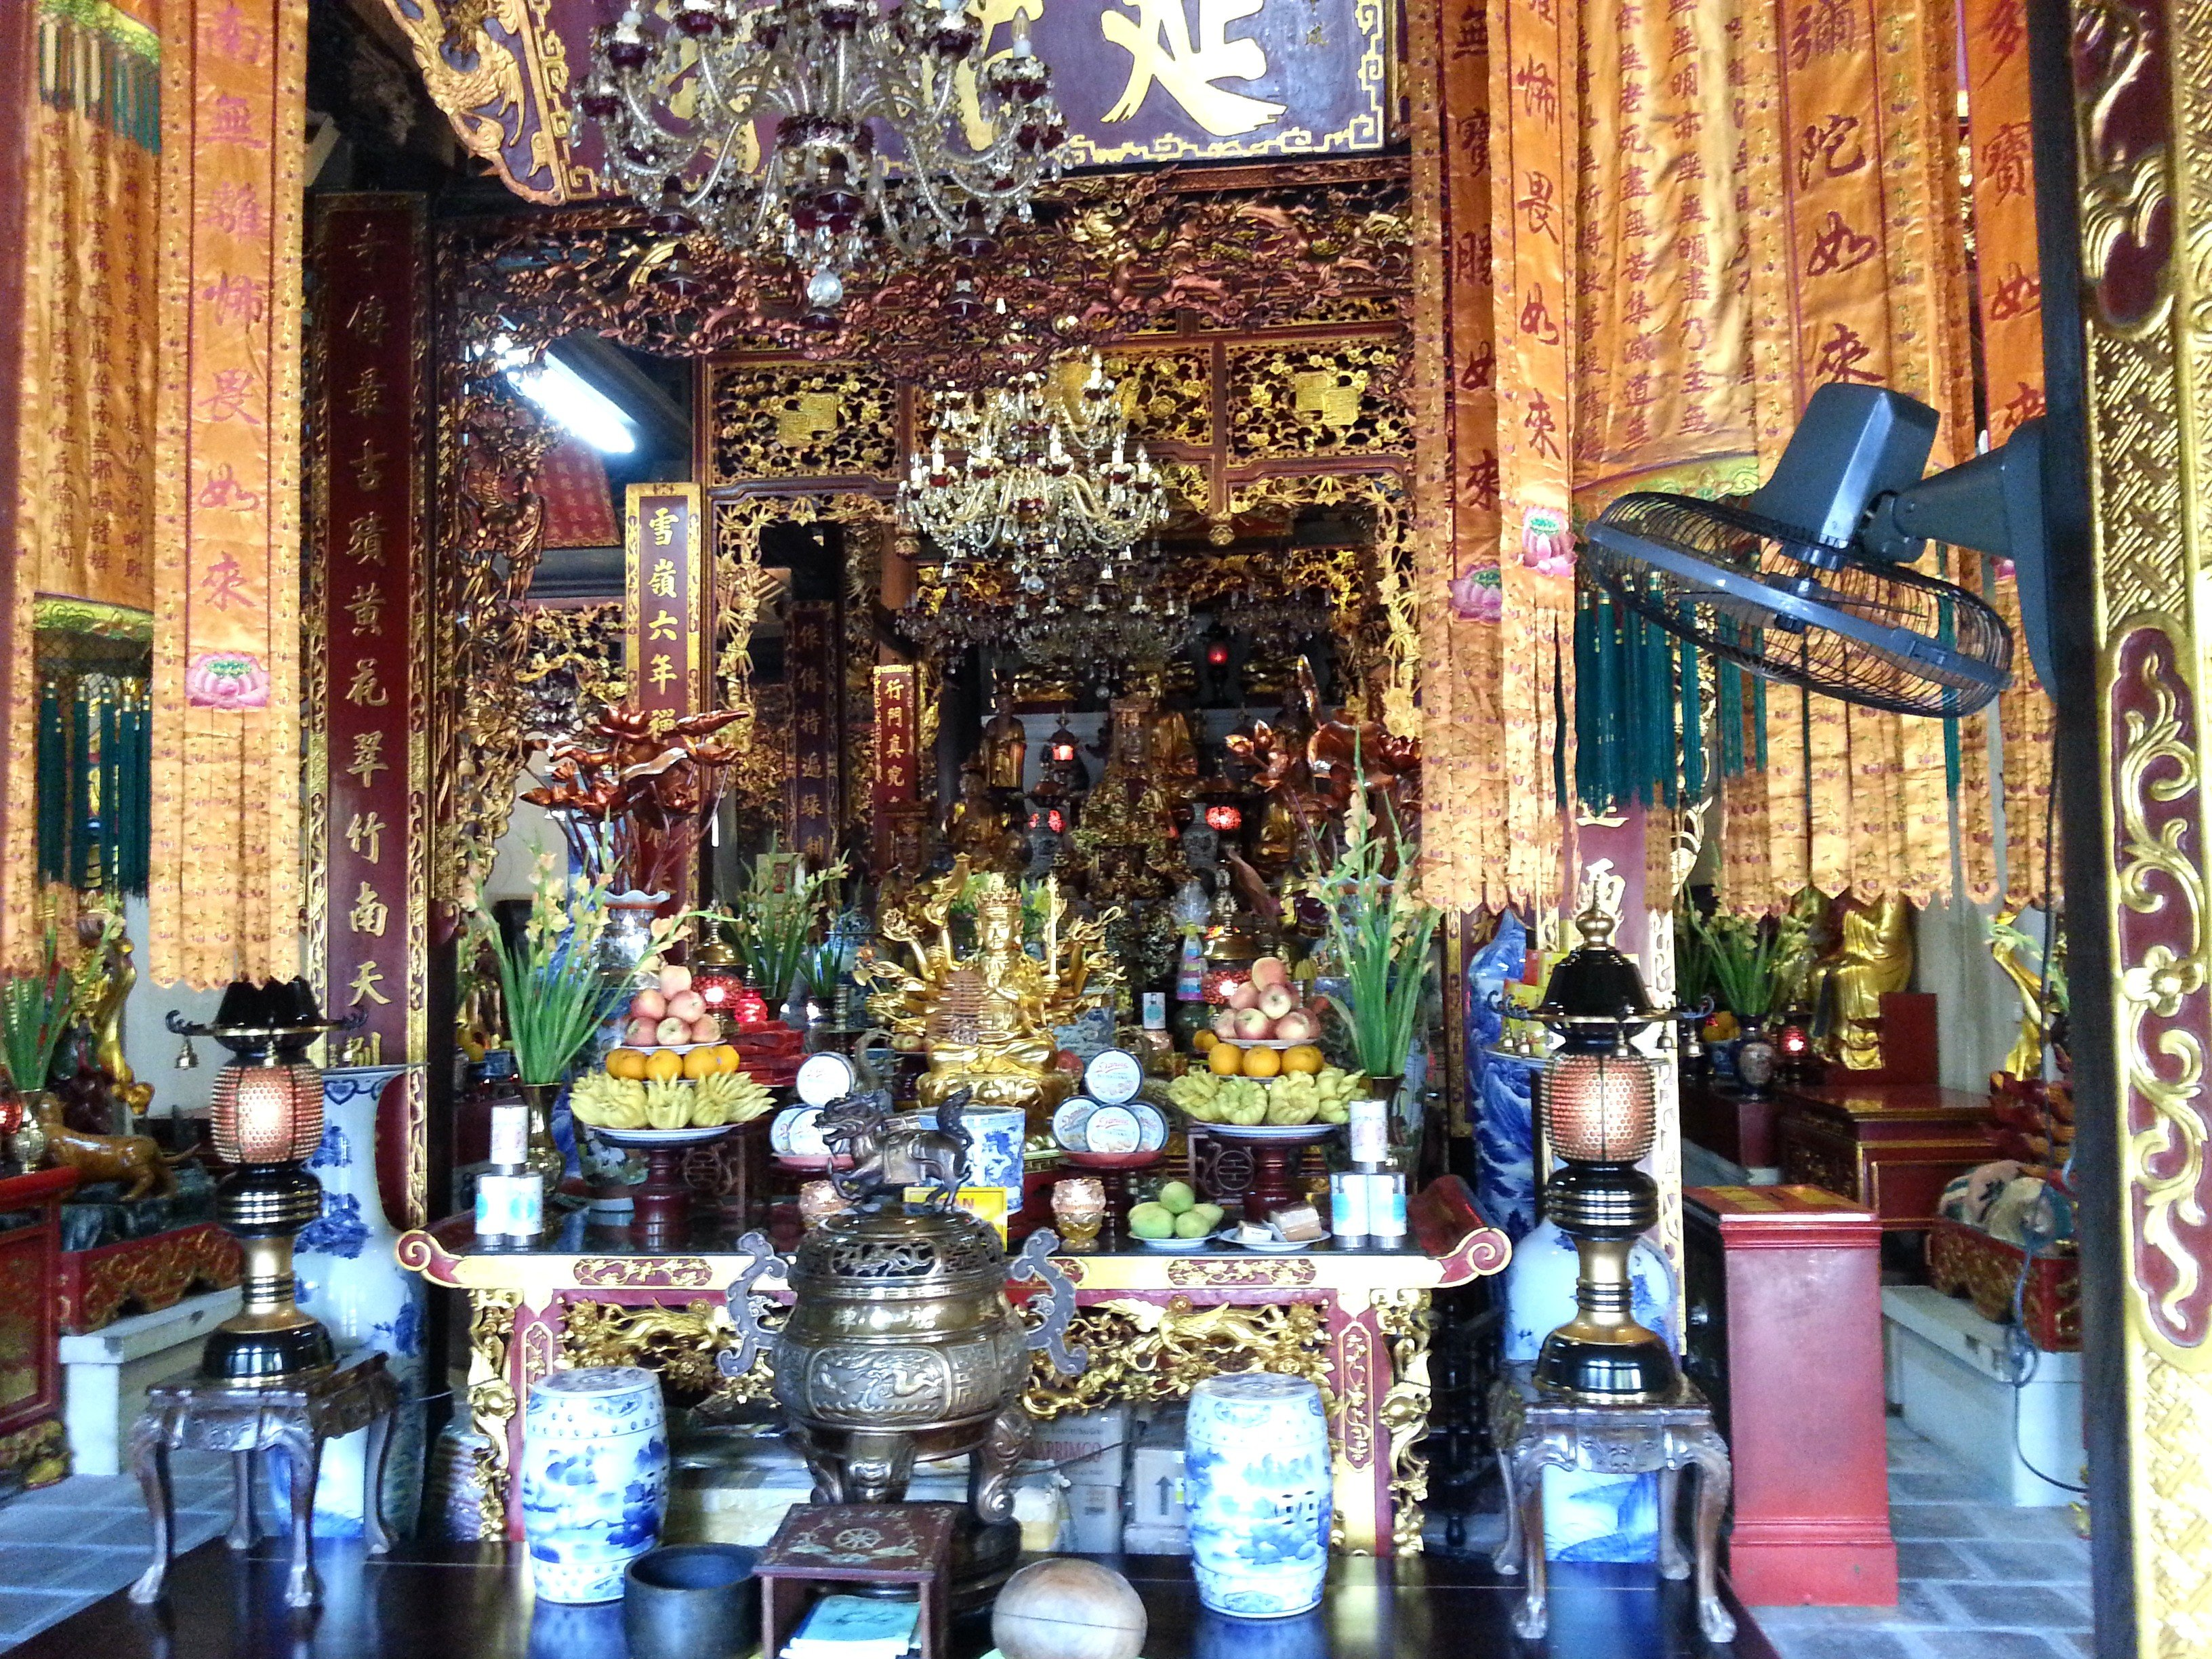 Avalokiteśvara Shrine at Chua Dien Huu Pagoda